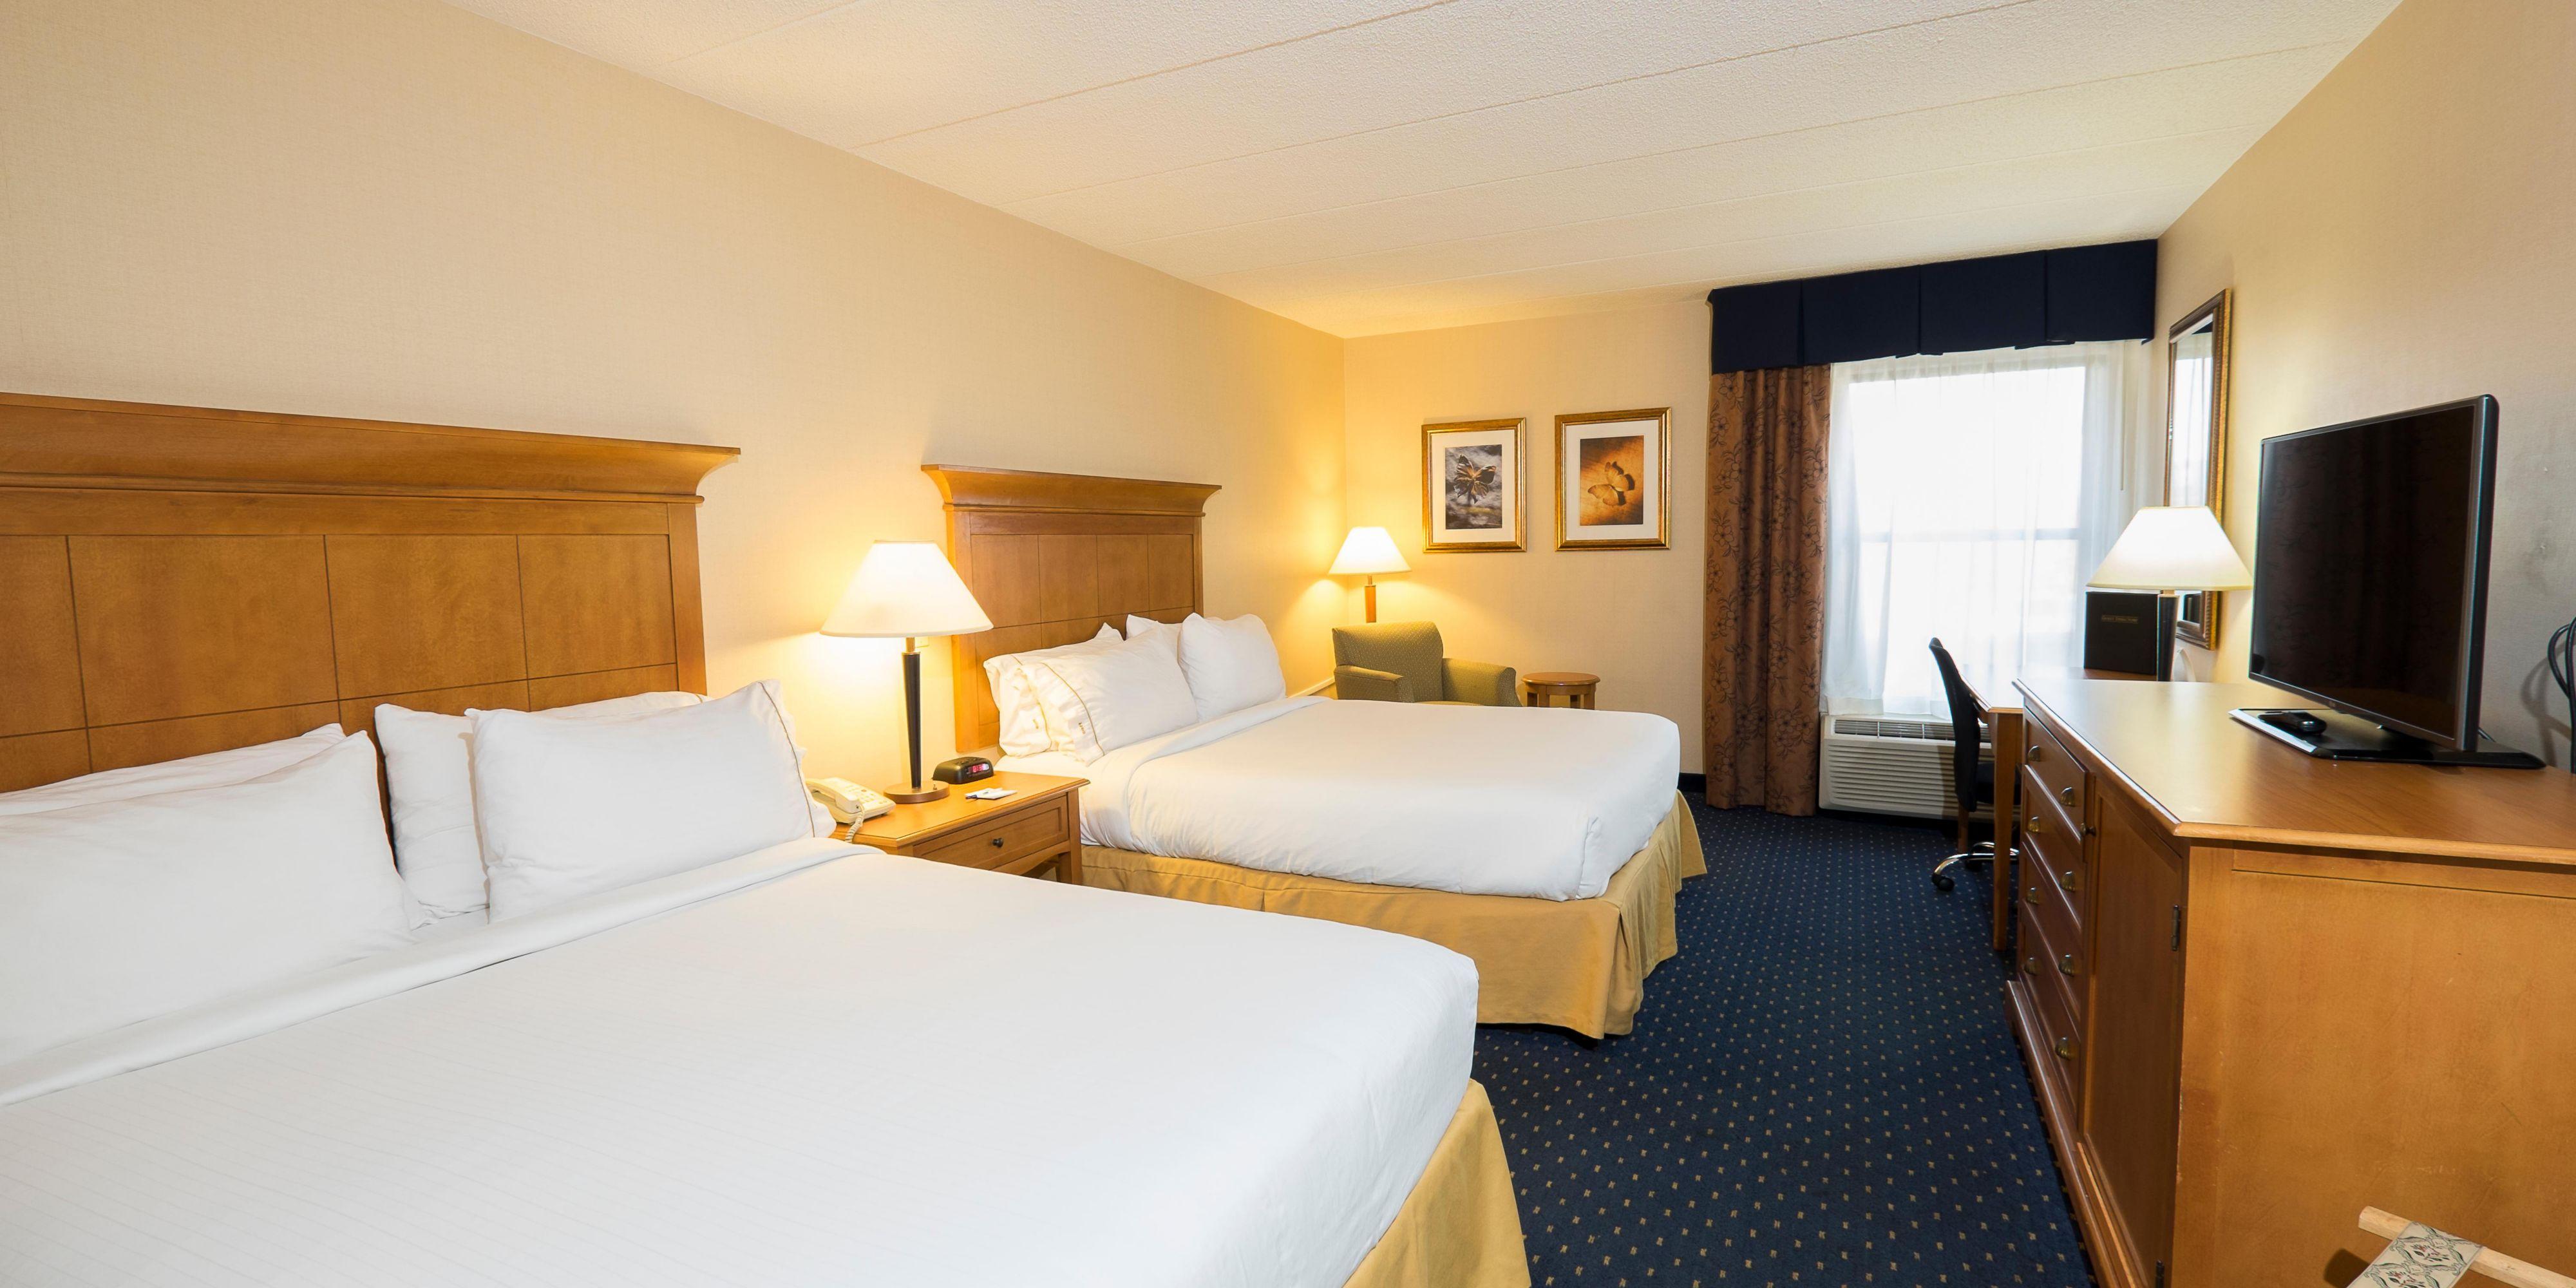 Holiday Inn Express And Suites Waynesboro 3895583874 2x1